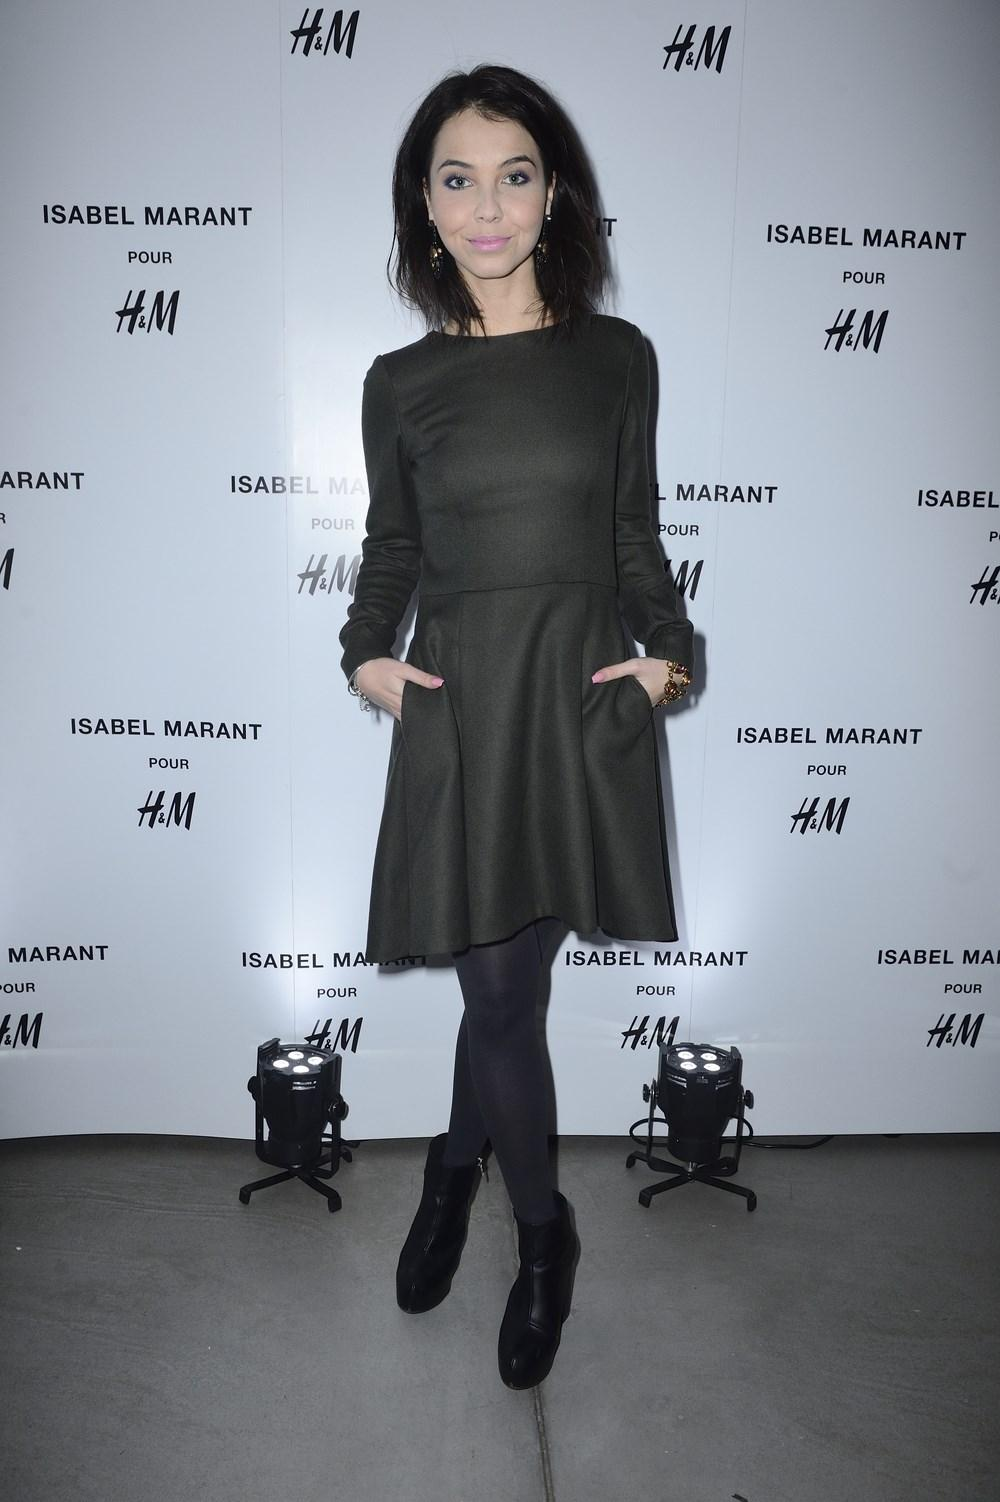 5c45987c15af5 Premiera kolekcji Isabel Marant dla H&M - Newsy - Polki.pl